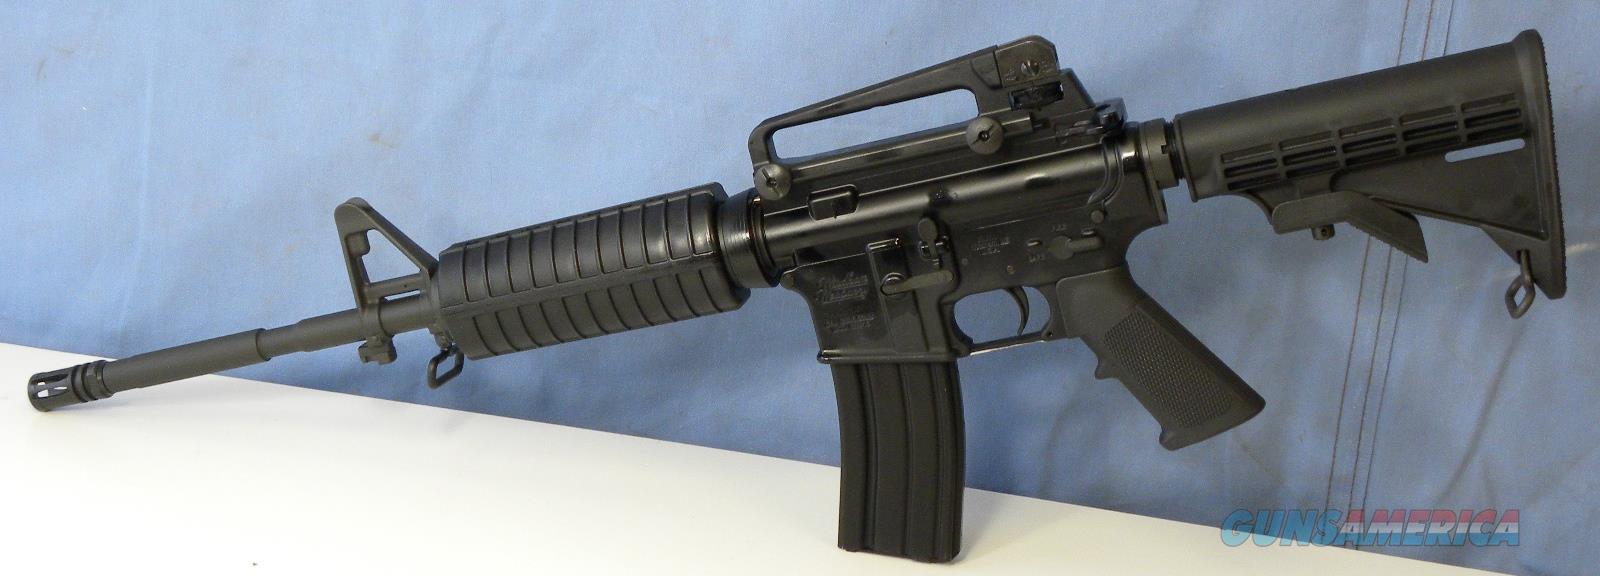 Windham Weaponry R16M4A4T  Guns > Rifles > Windham Weaponry Rifles